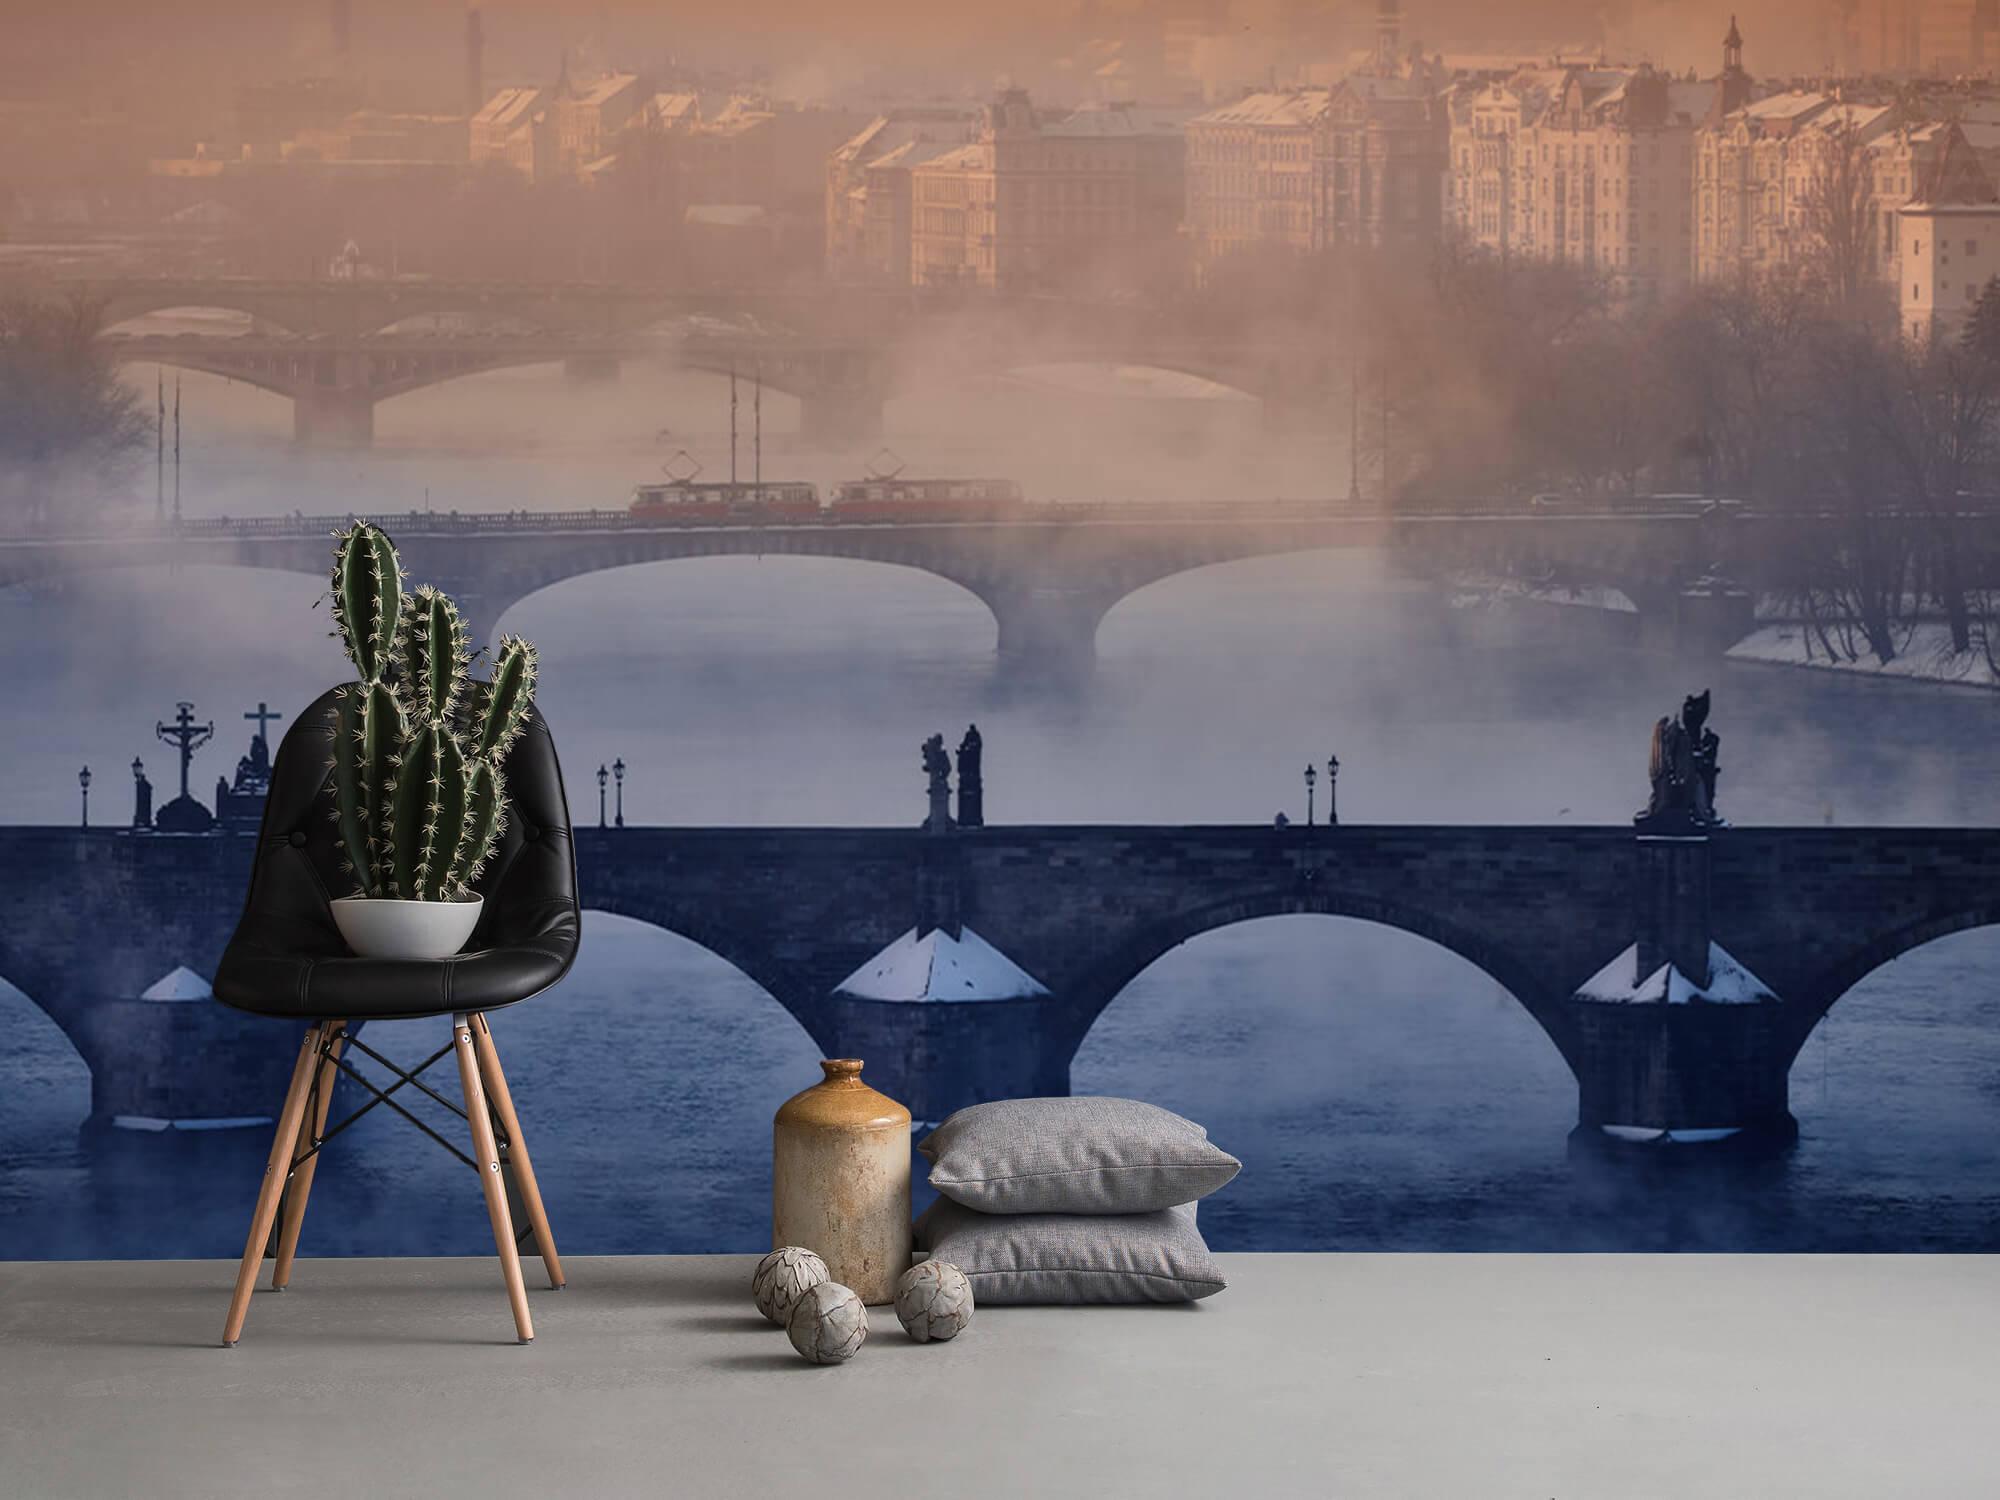 Prague - Winter Mood 9